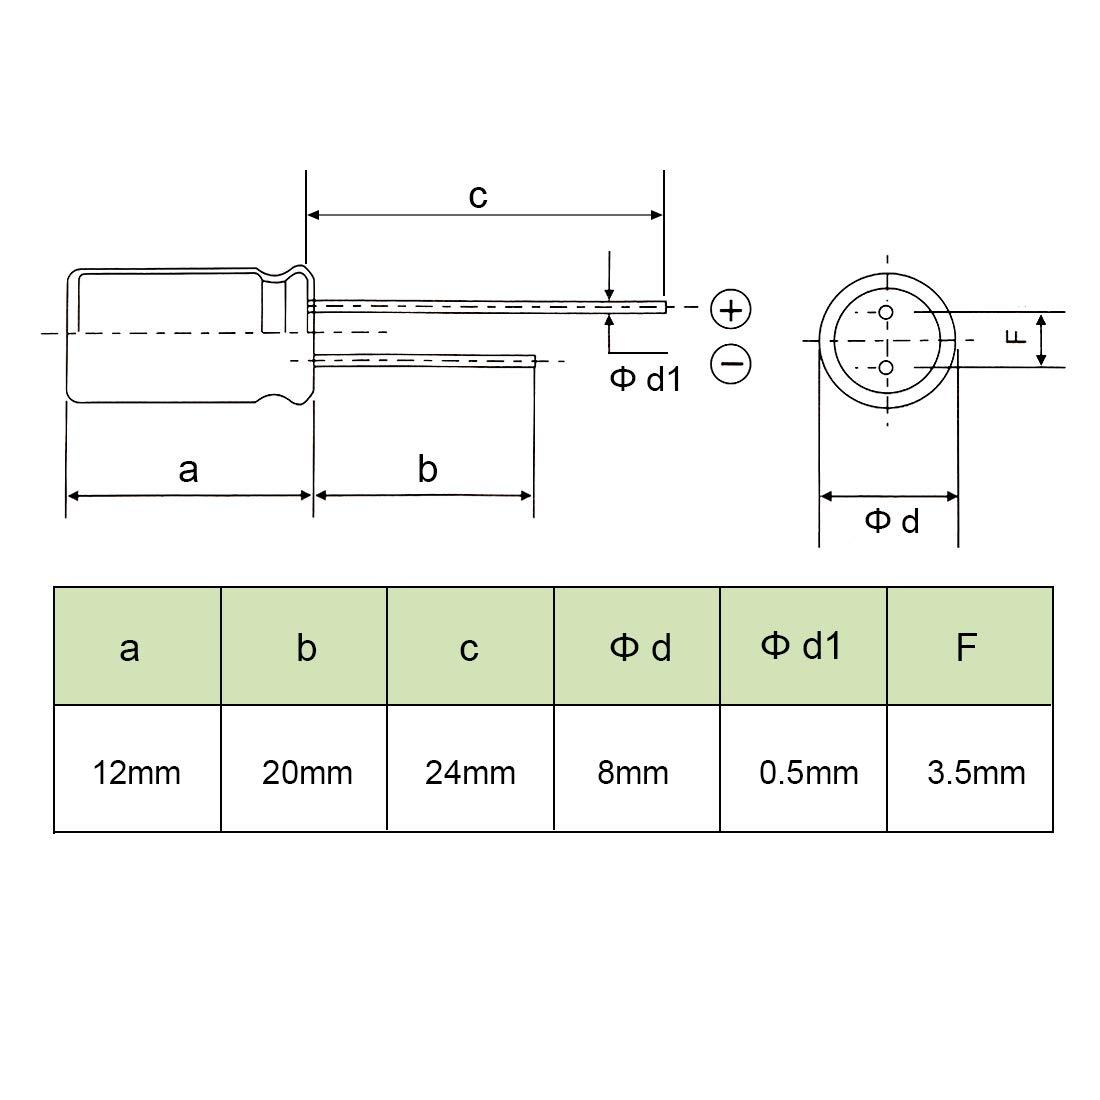 25V 1000uf CONDENSATEUR ELECTROLYTIQUE EN ALUMINIUM 20/%  RADIAL C101Z